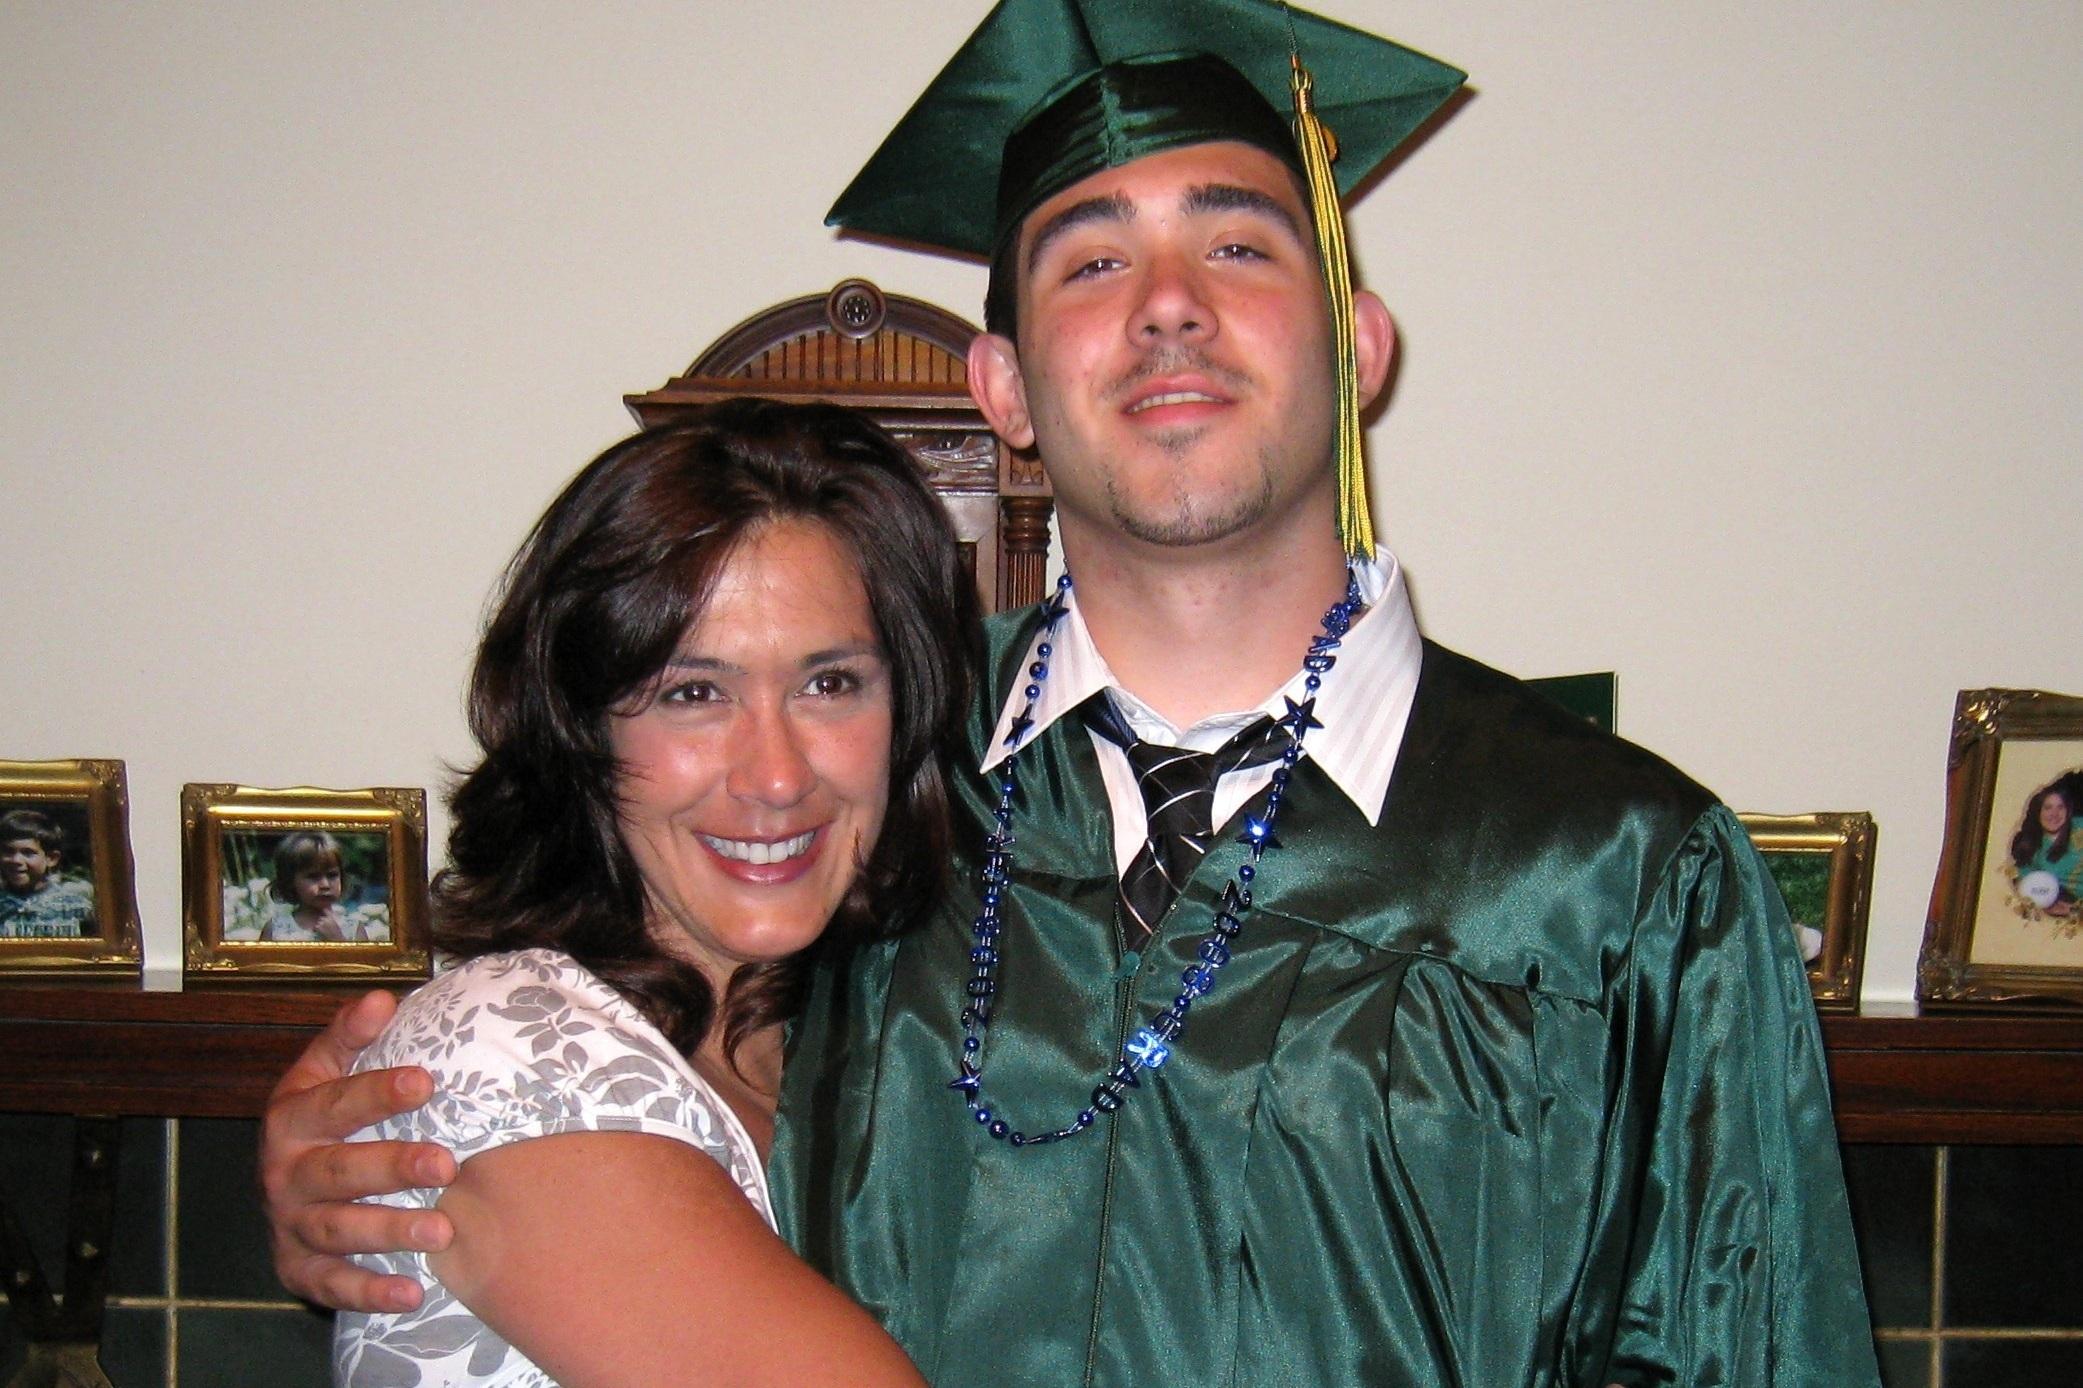 Maitri Medicinals Director of Pharmacy, Terri Kroh, and her son, Ryan